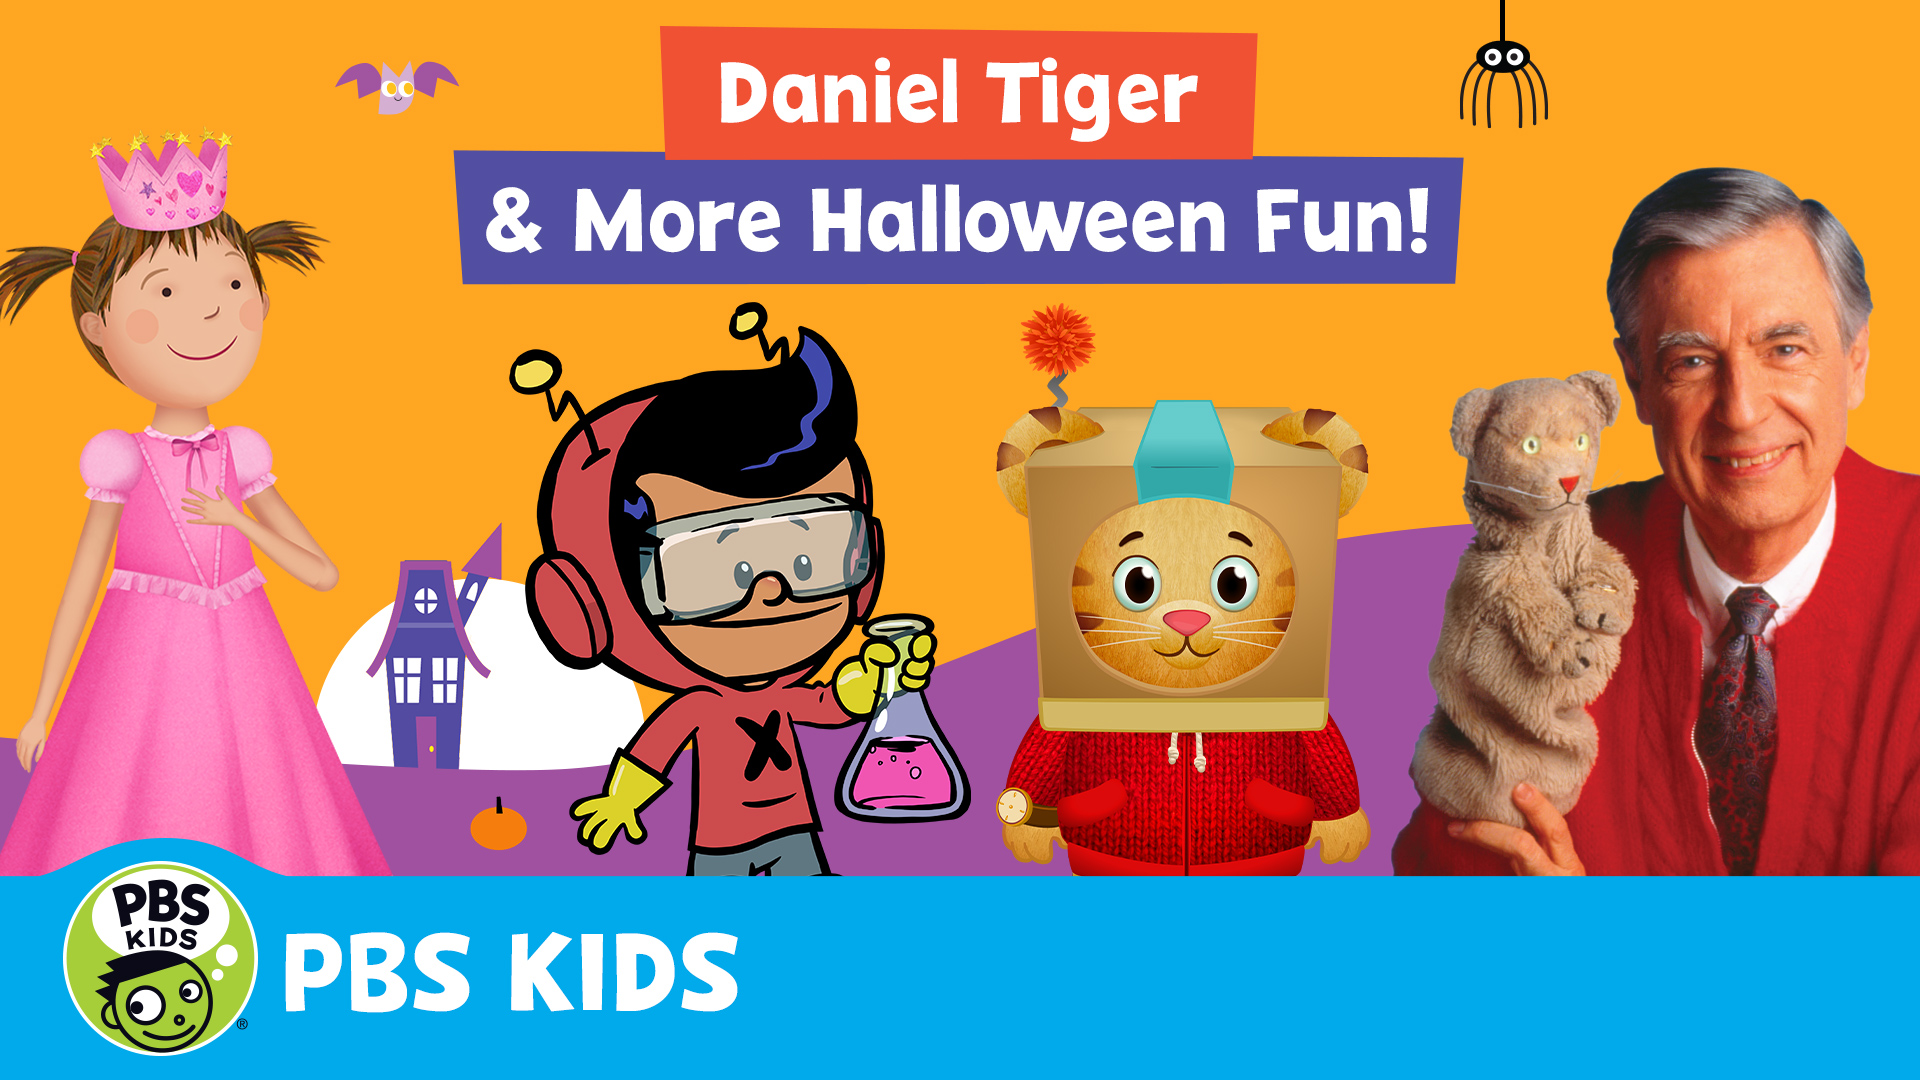 Daniel Tiger and More Halloween Fun!